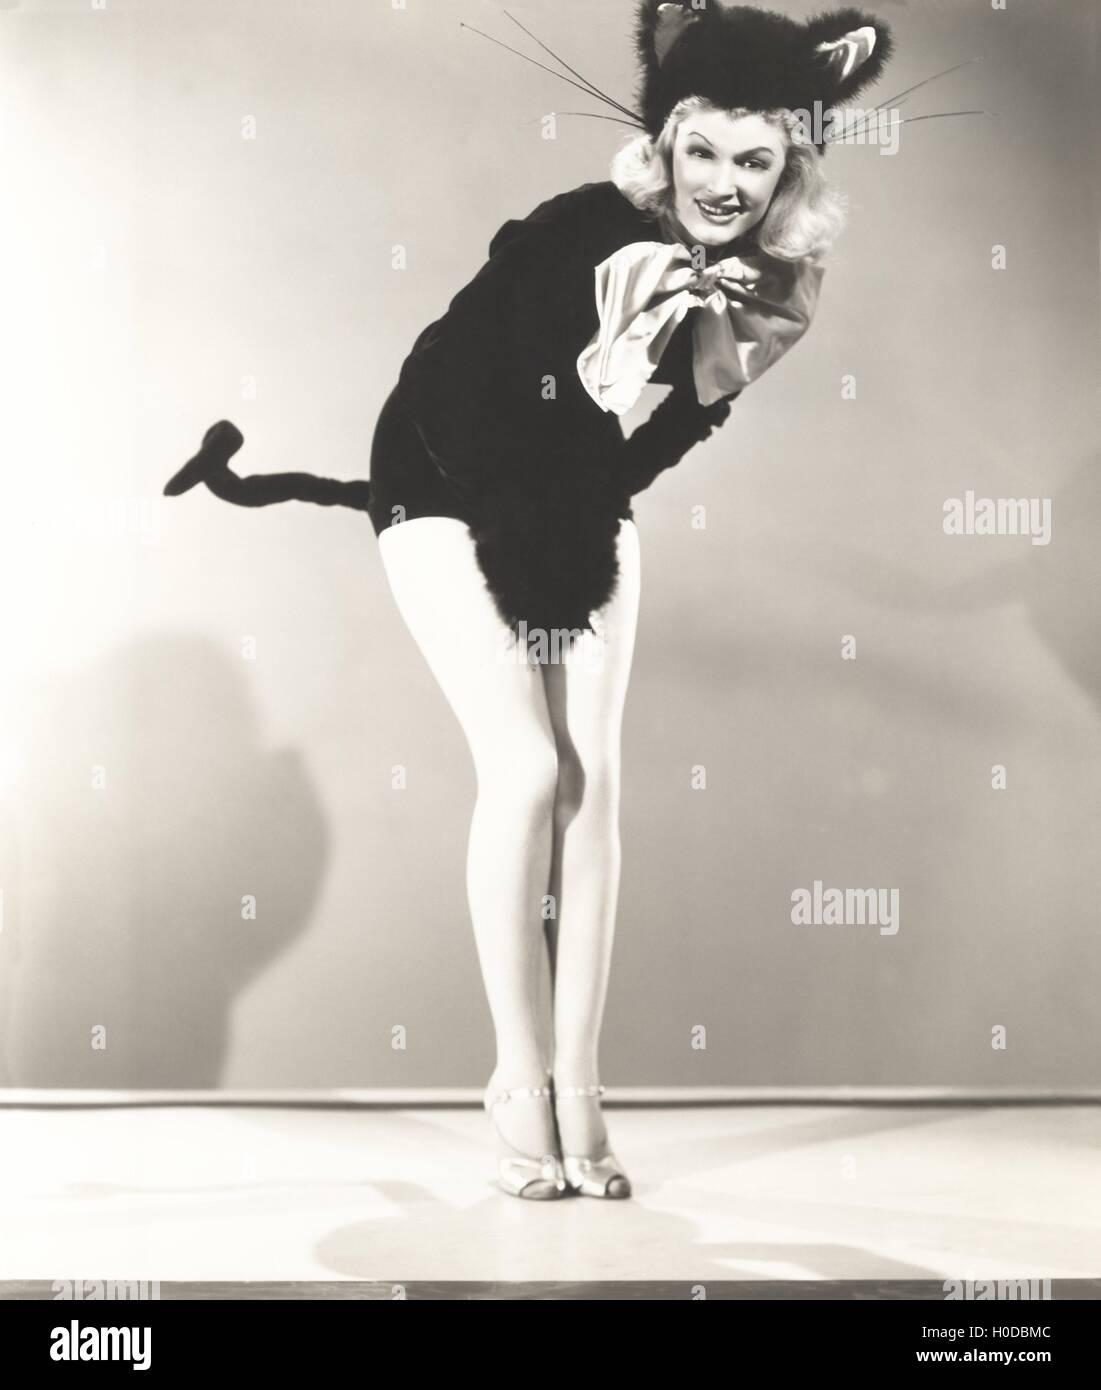 Woman wearing cat costume - Stock Image